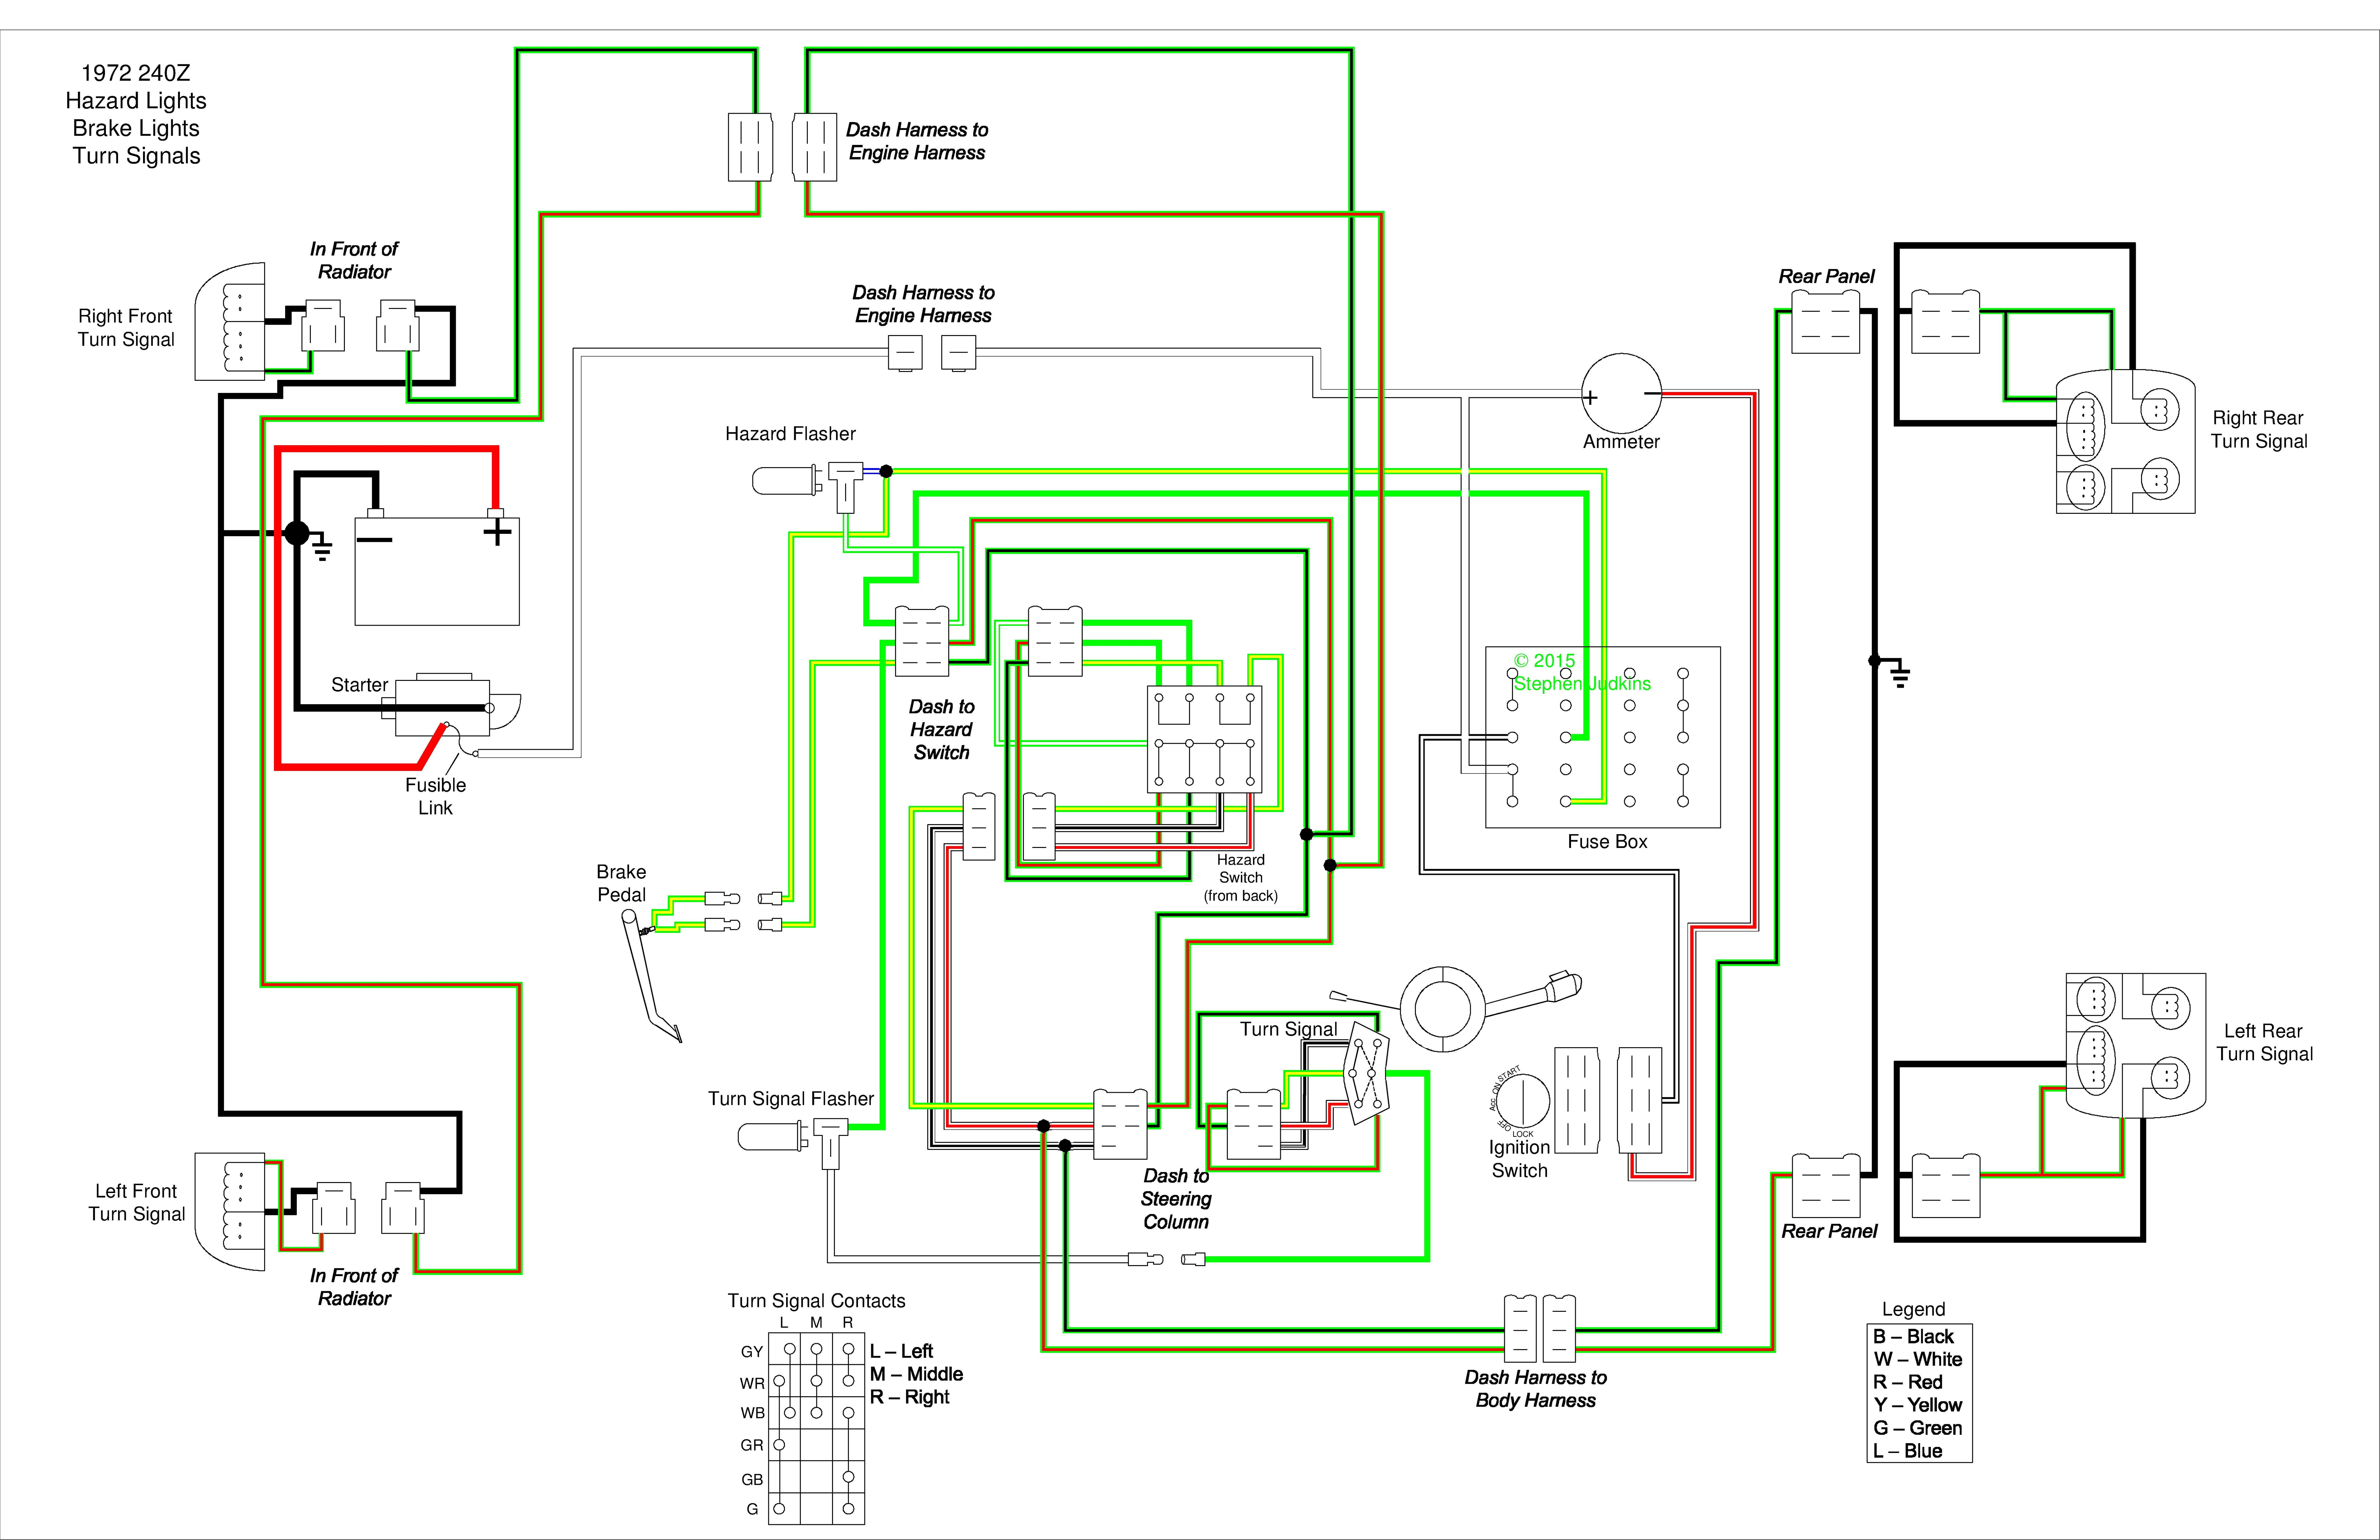 1971 datsun 510 wiring diagram 4age alternator 240z motor